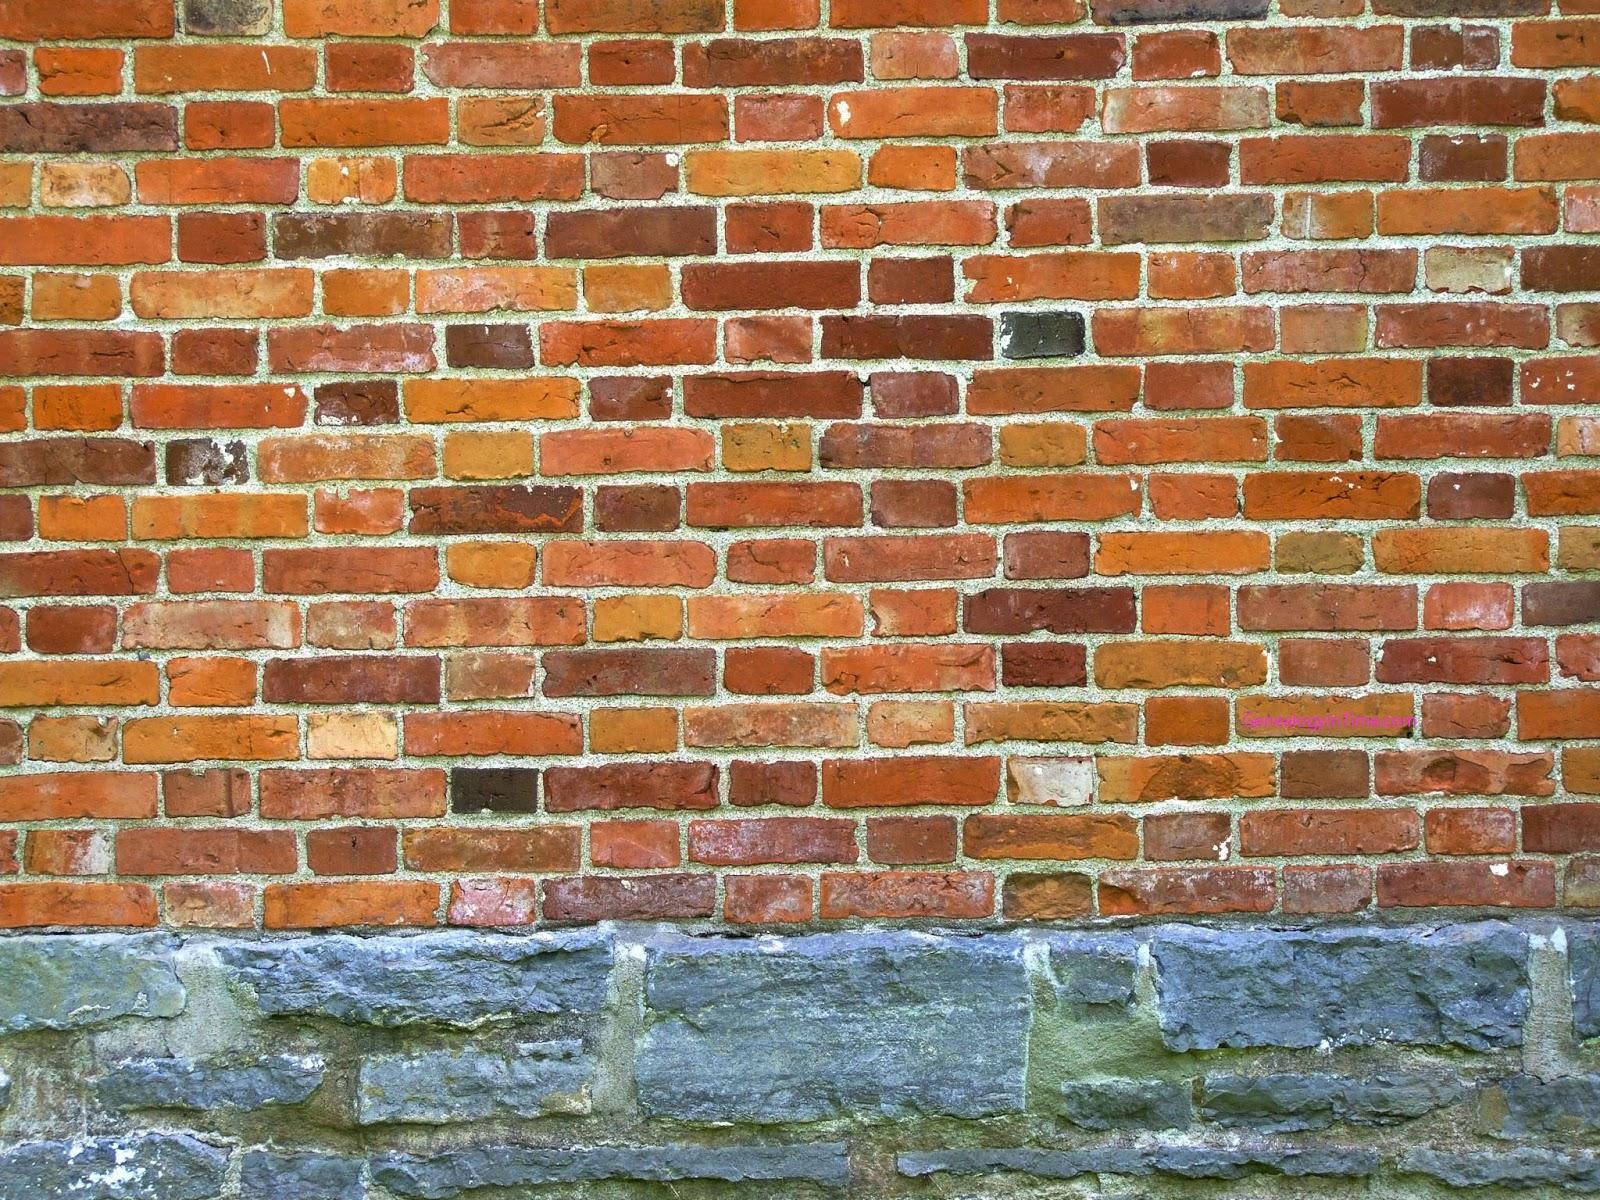 brick wallpaper brick wallpaper brick wallpaper brick wallpaper brick 1600x1200